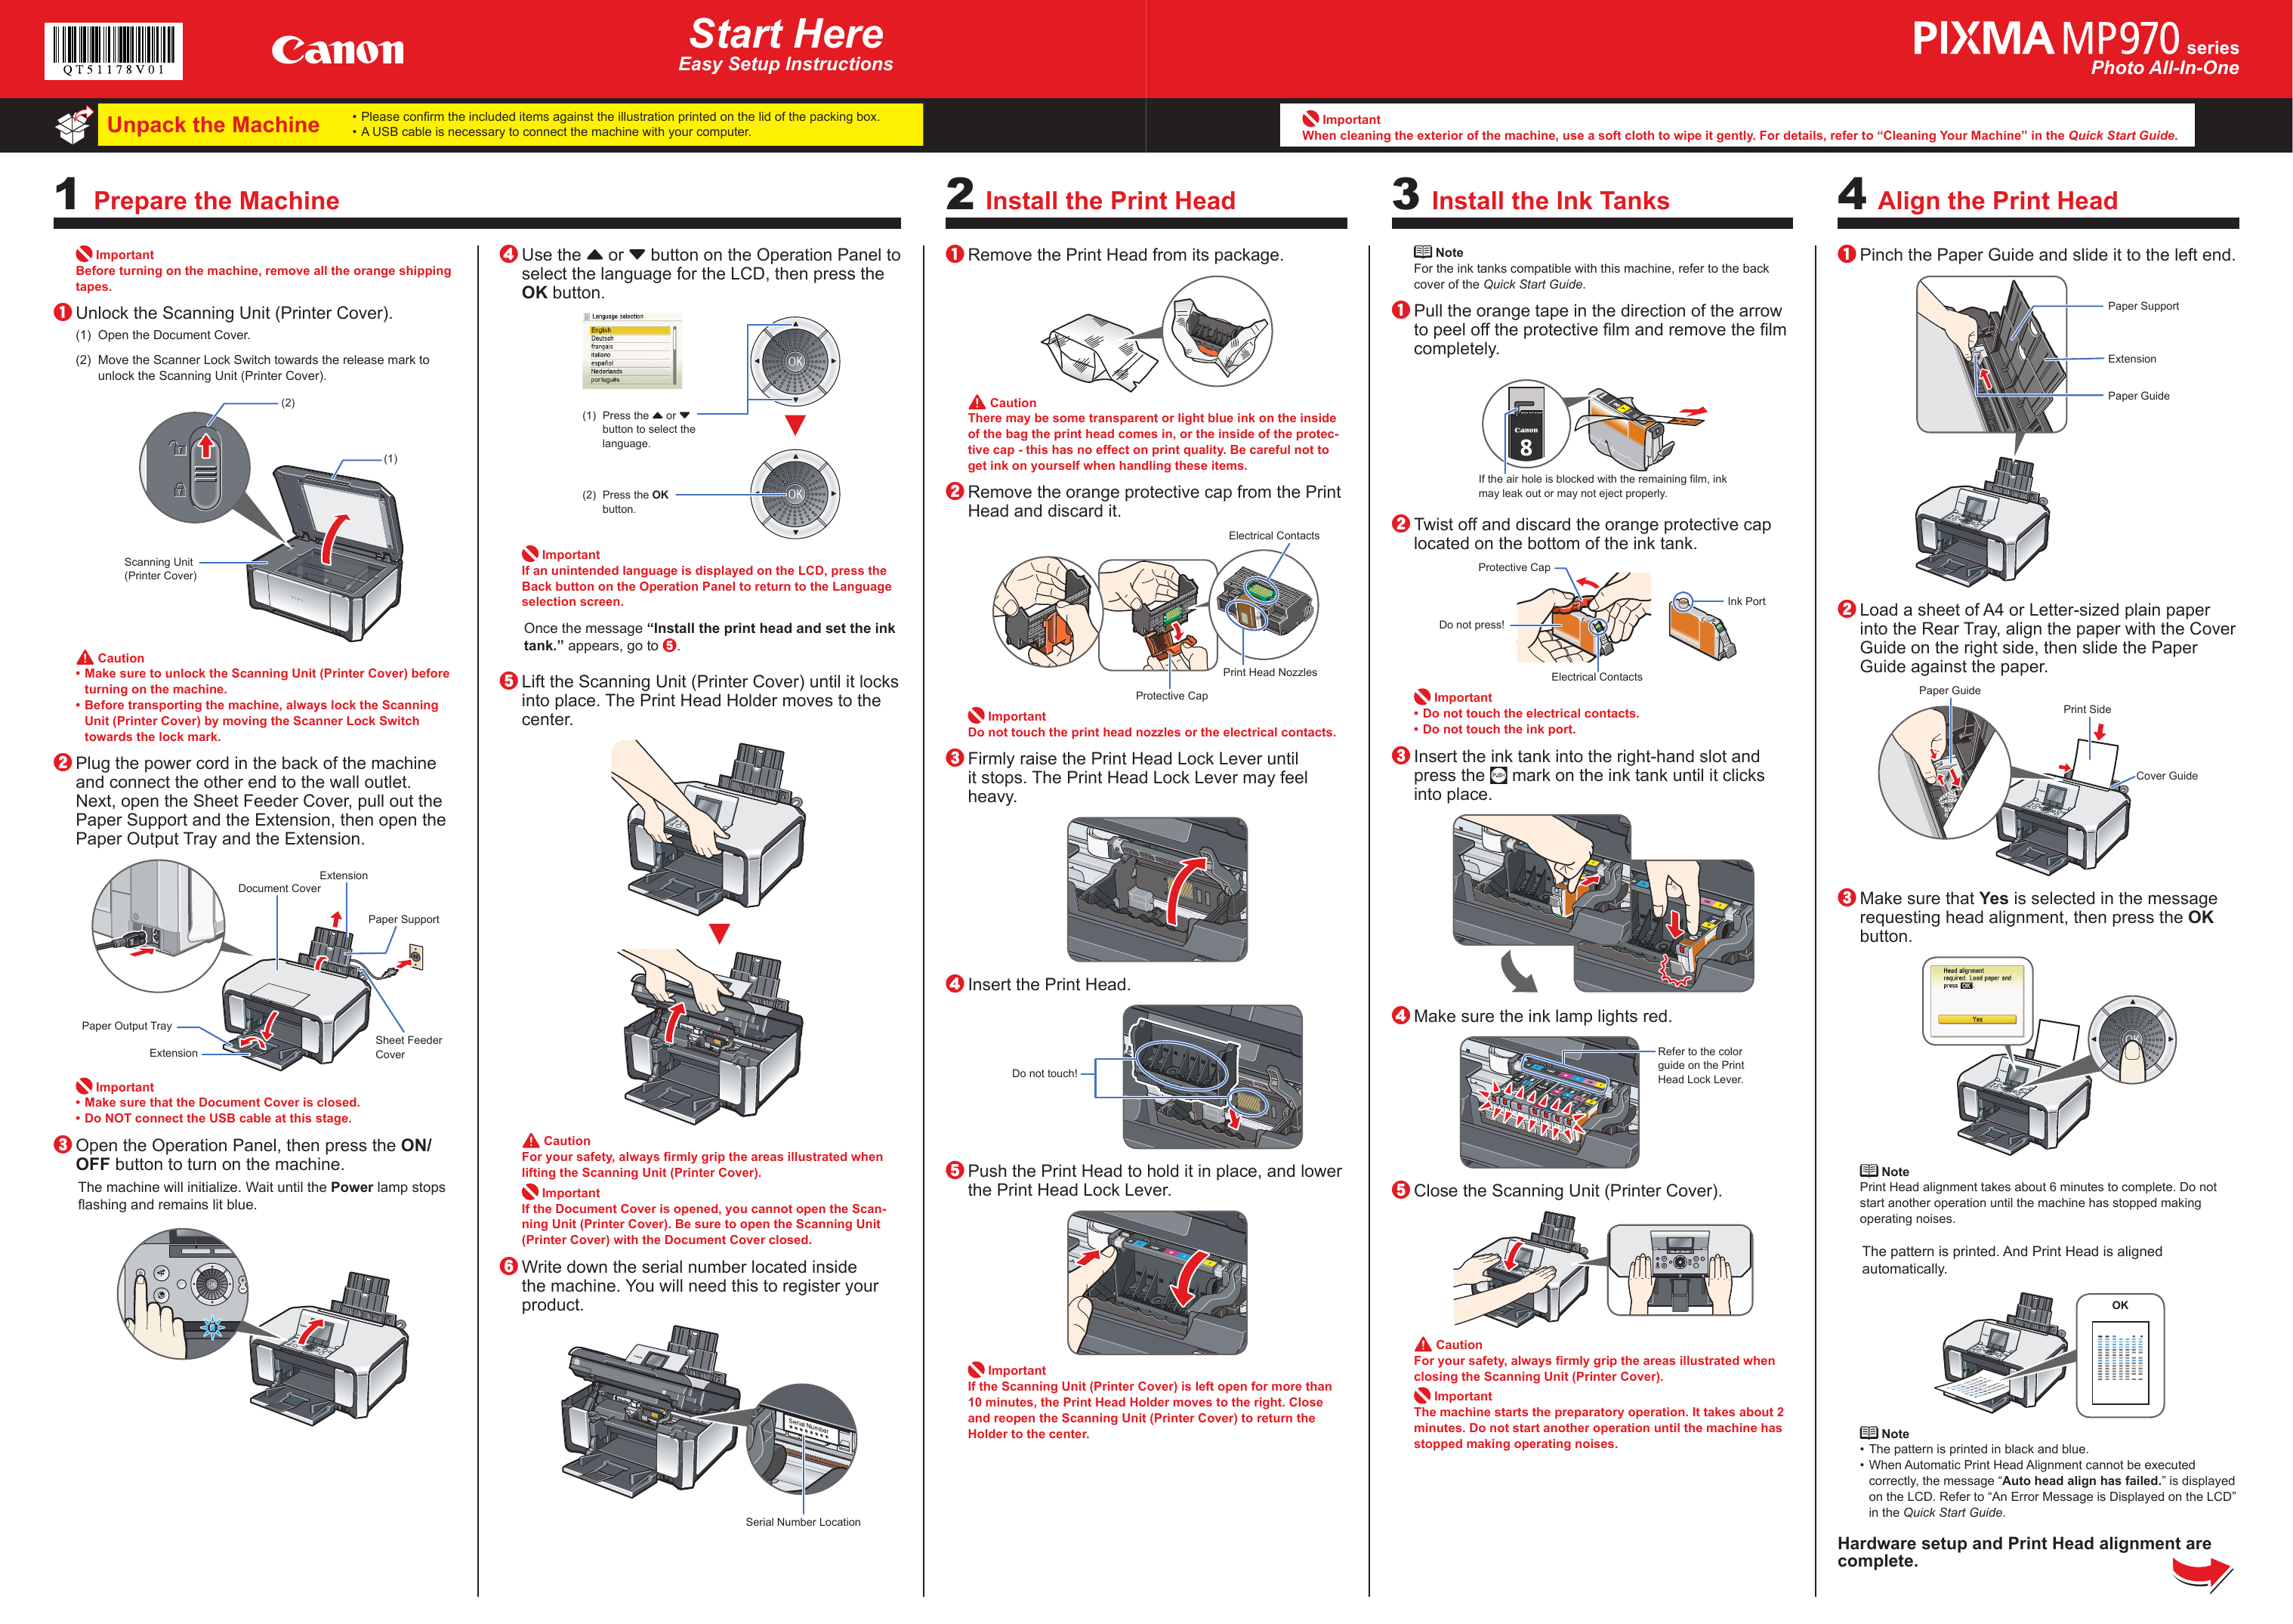 canon printers user manual basic instruction manual u2022 rh ryanshtuff co canon printer user guide online Install Canon Wireless Printer